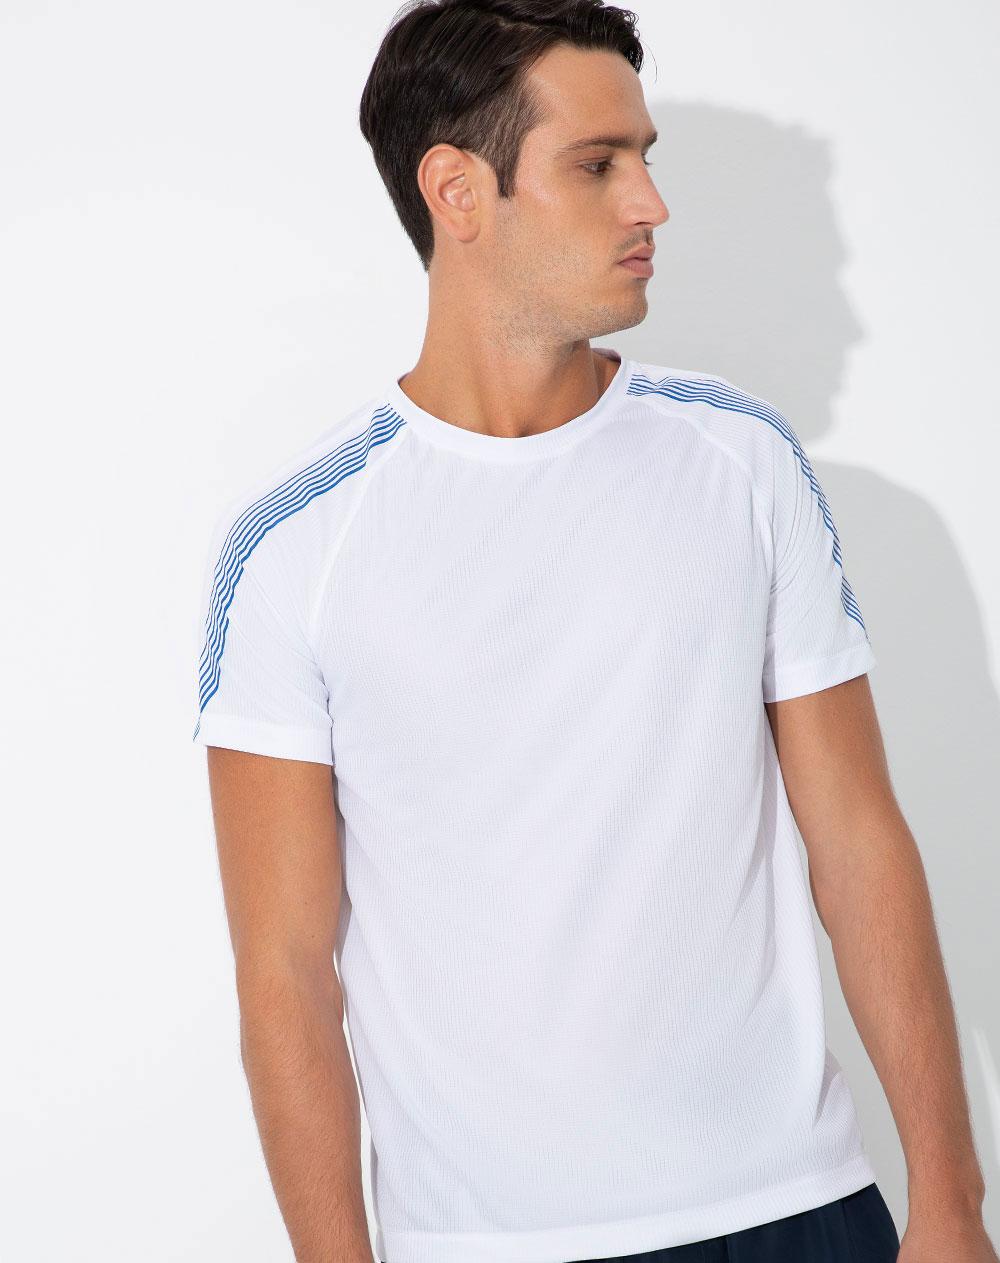 De Blanco Secado Camiseta Punto Rápido Fetre Hombre Blanca zMpqUSVLG